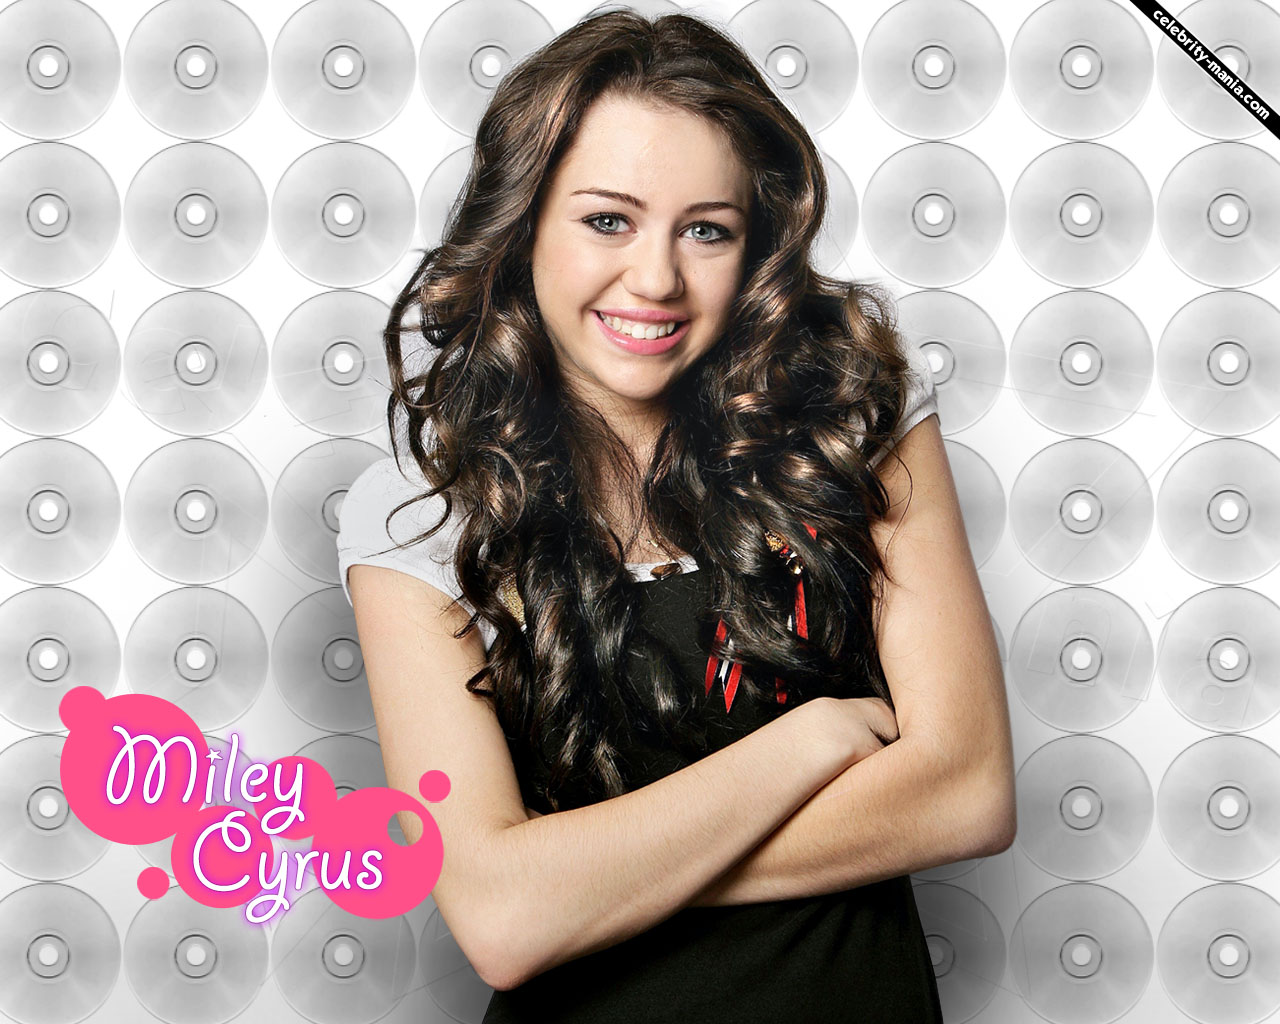 Tylerandkenzie Miley Cyrus Wallpapers-4944